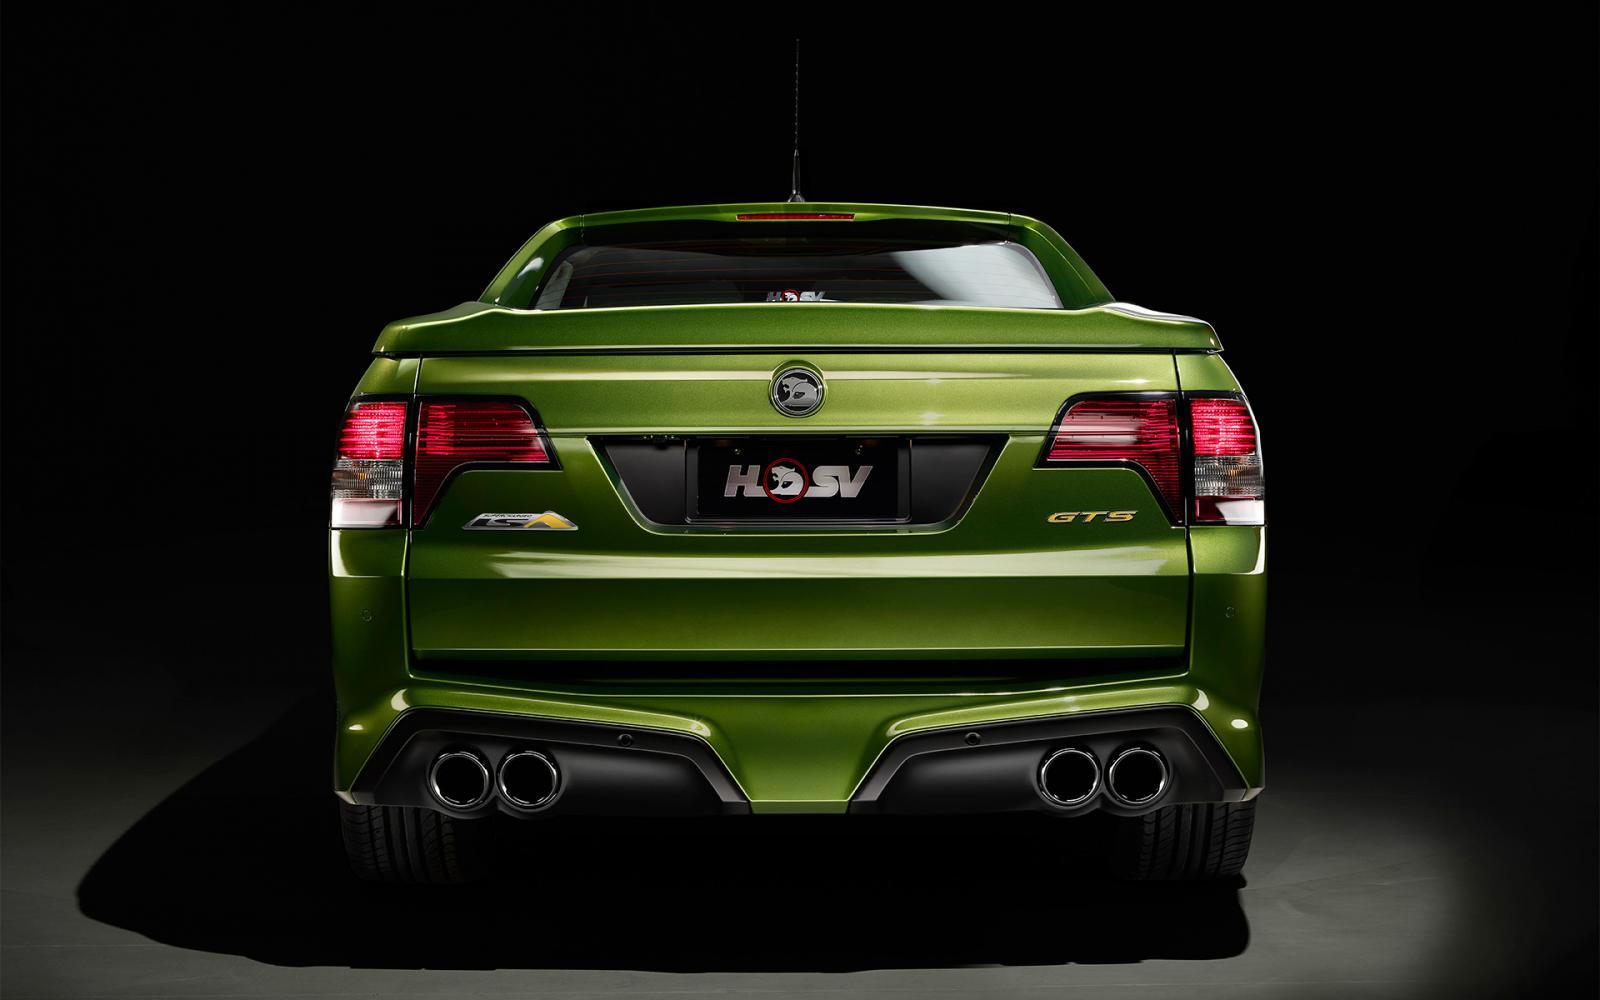 HSV GTS Maloo Packs 430 kW of Aussie Grunt [Video] - autoevolution